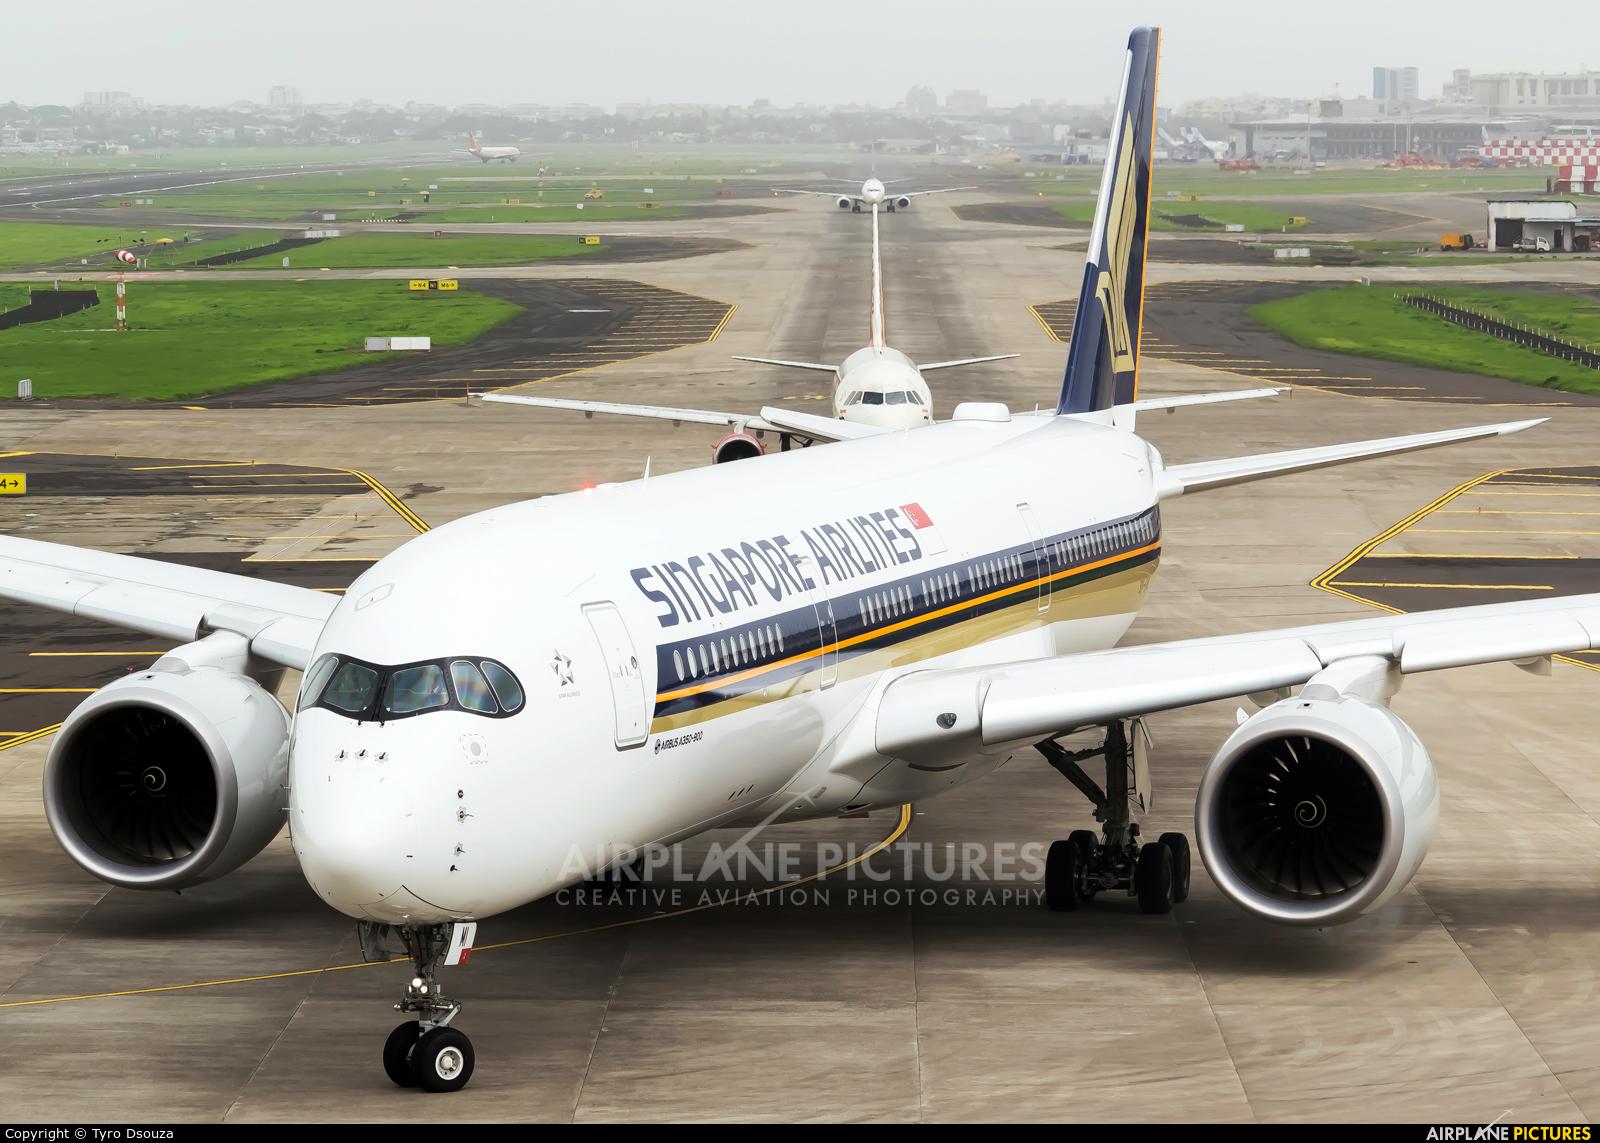 Singapore Airlines 9V-SMI aircraft at Mumbai - Chhatrapati Shivaji Intl